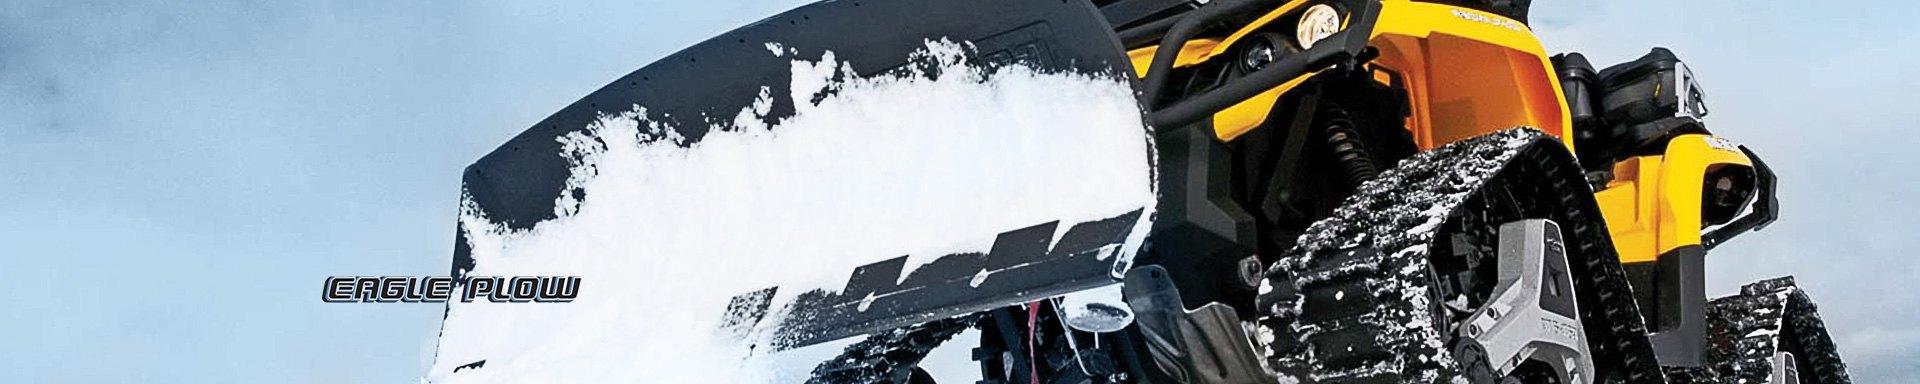 Eagle plow atv utv mounting kits blades winches carid eagle plow select vehicle publicscrutiny Image collections